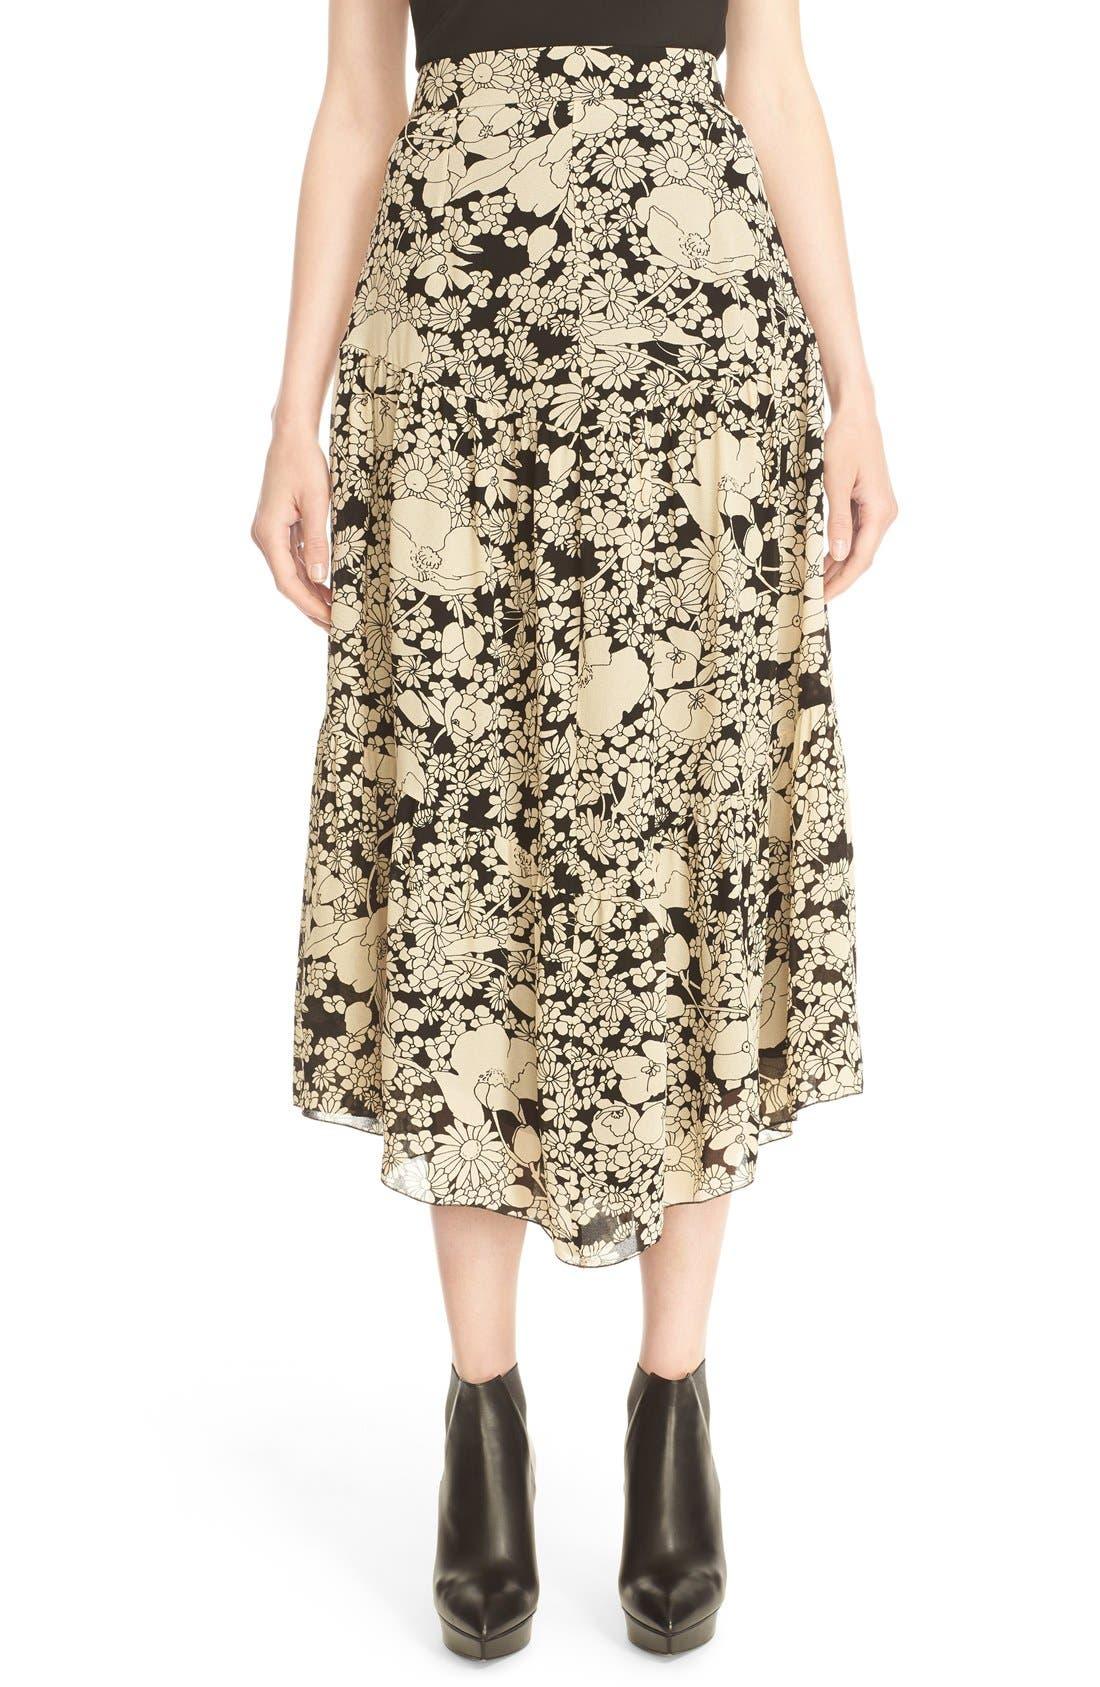 Alternate Image 1 Selected - Saint Laurent Floral Print Crepe Midi Skirt